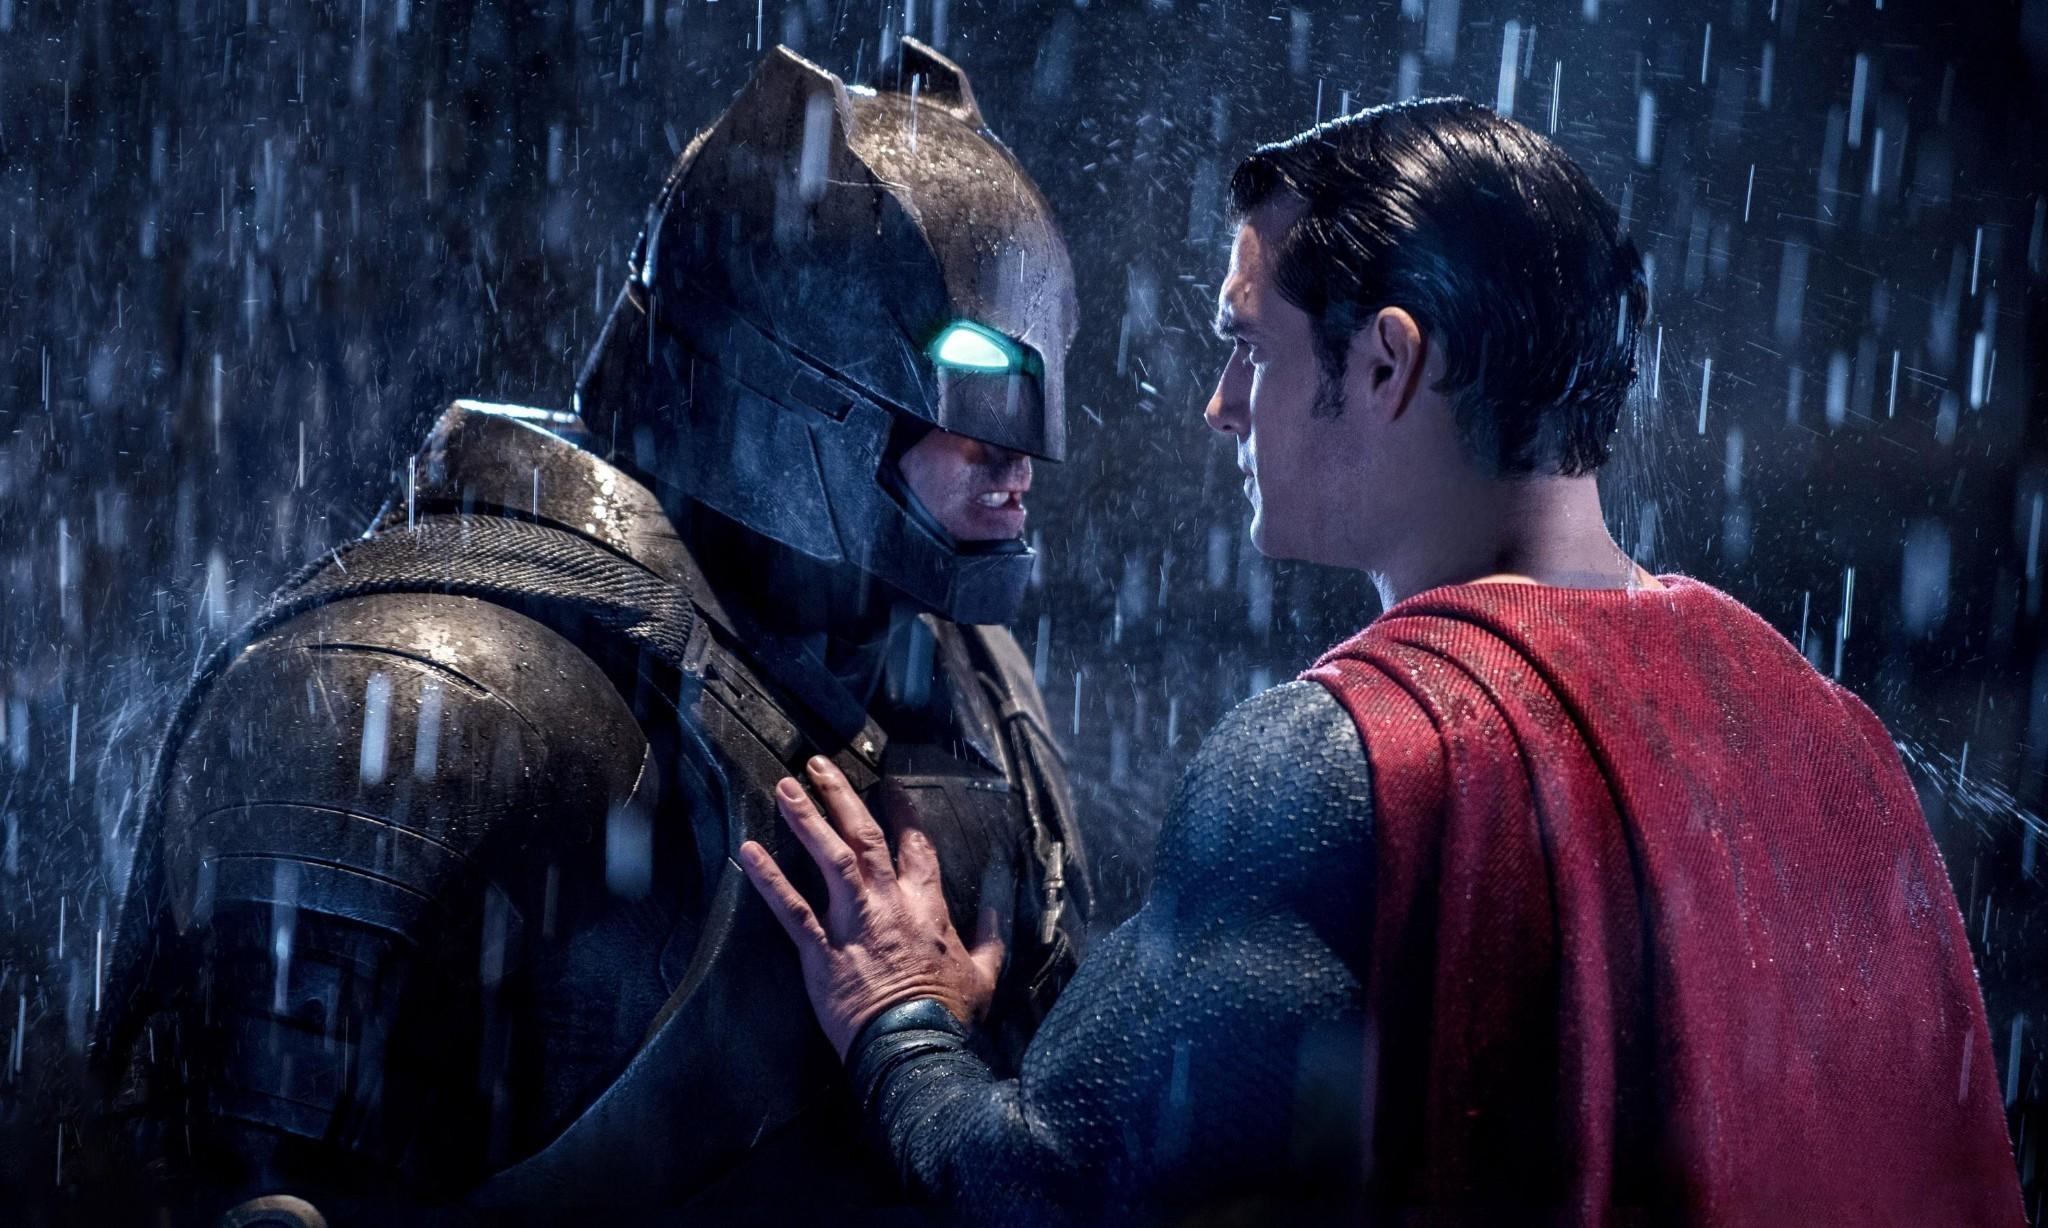 Ben Affleck 'humiliated' by Batman v Superman: Dawn of Justice reviews